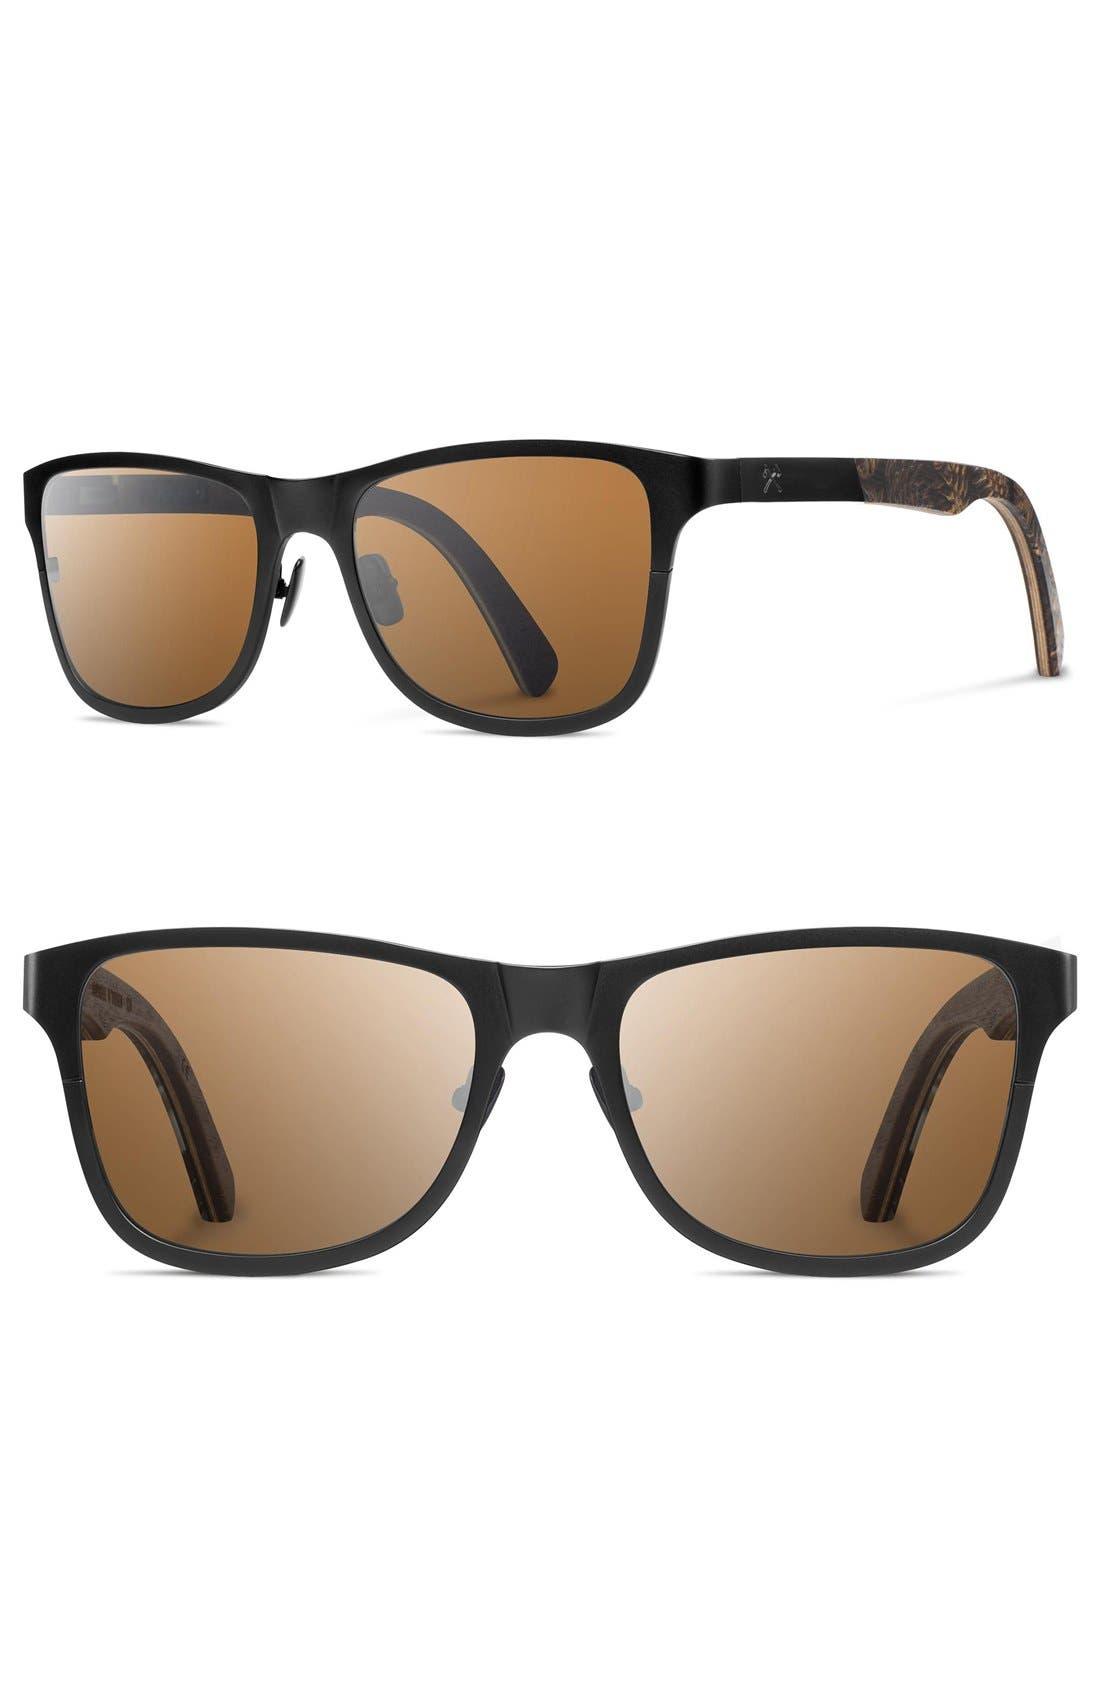 Canby 54mm Polarized Pine Cone & Titanium Sunglasses,                             Alternate thumbnail 2, color,                             BLACK/ PINECONE/ BROWN